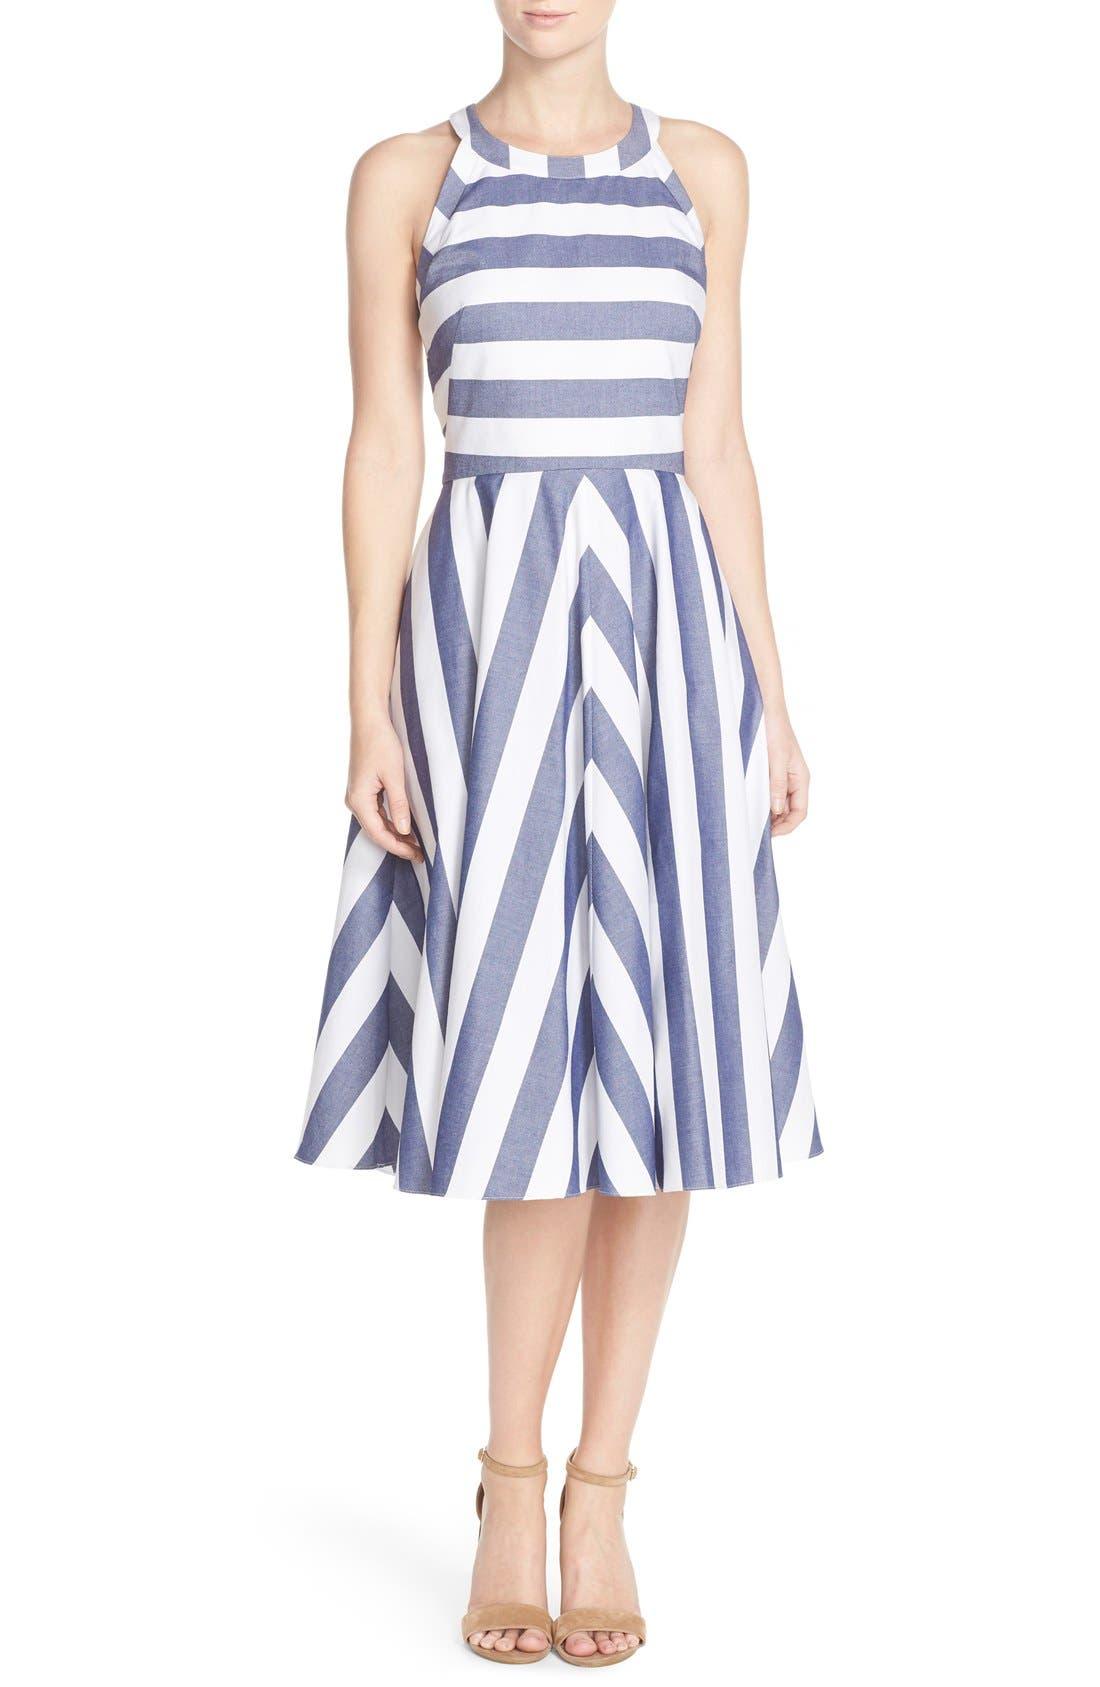 Alternate Image 1 Selected - Eliza J Cotton Fit & Flare Dress